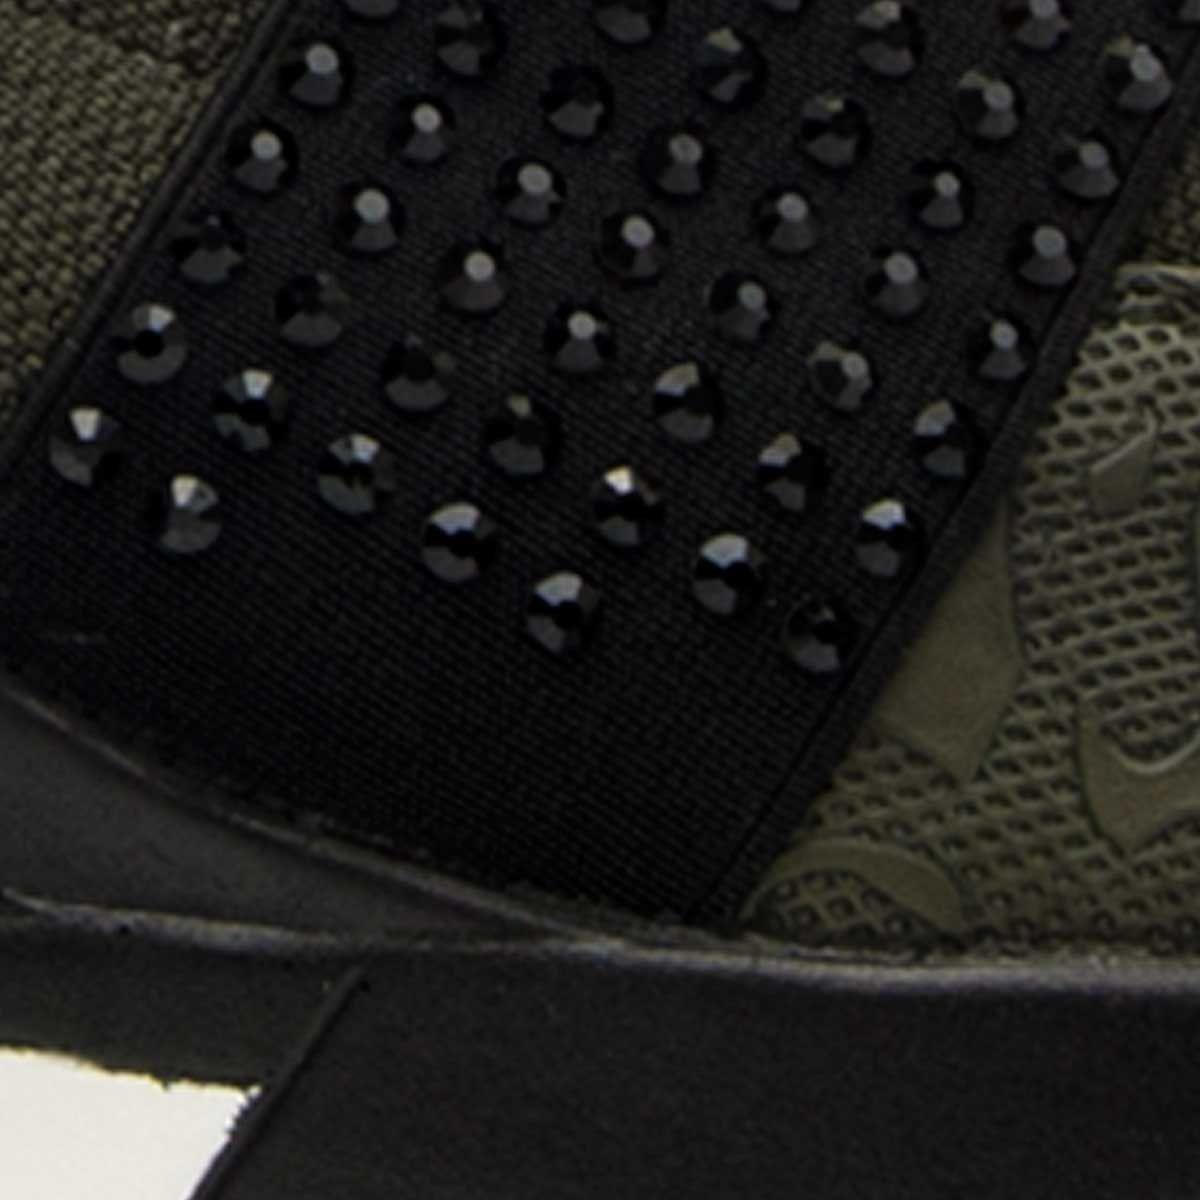 Montevita Sporty Sneaker Boot in Green